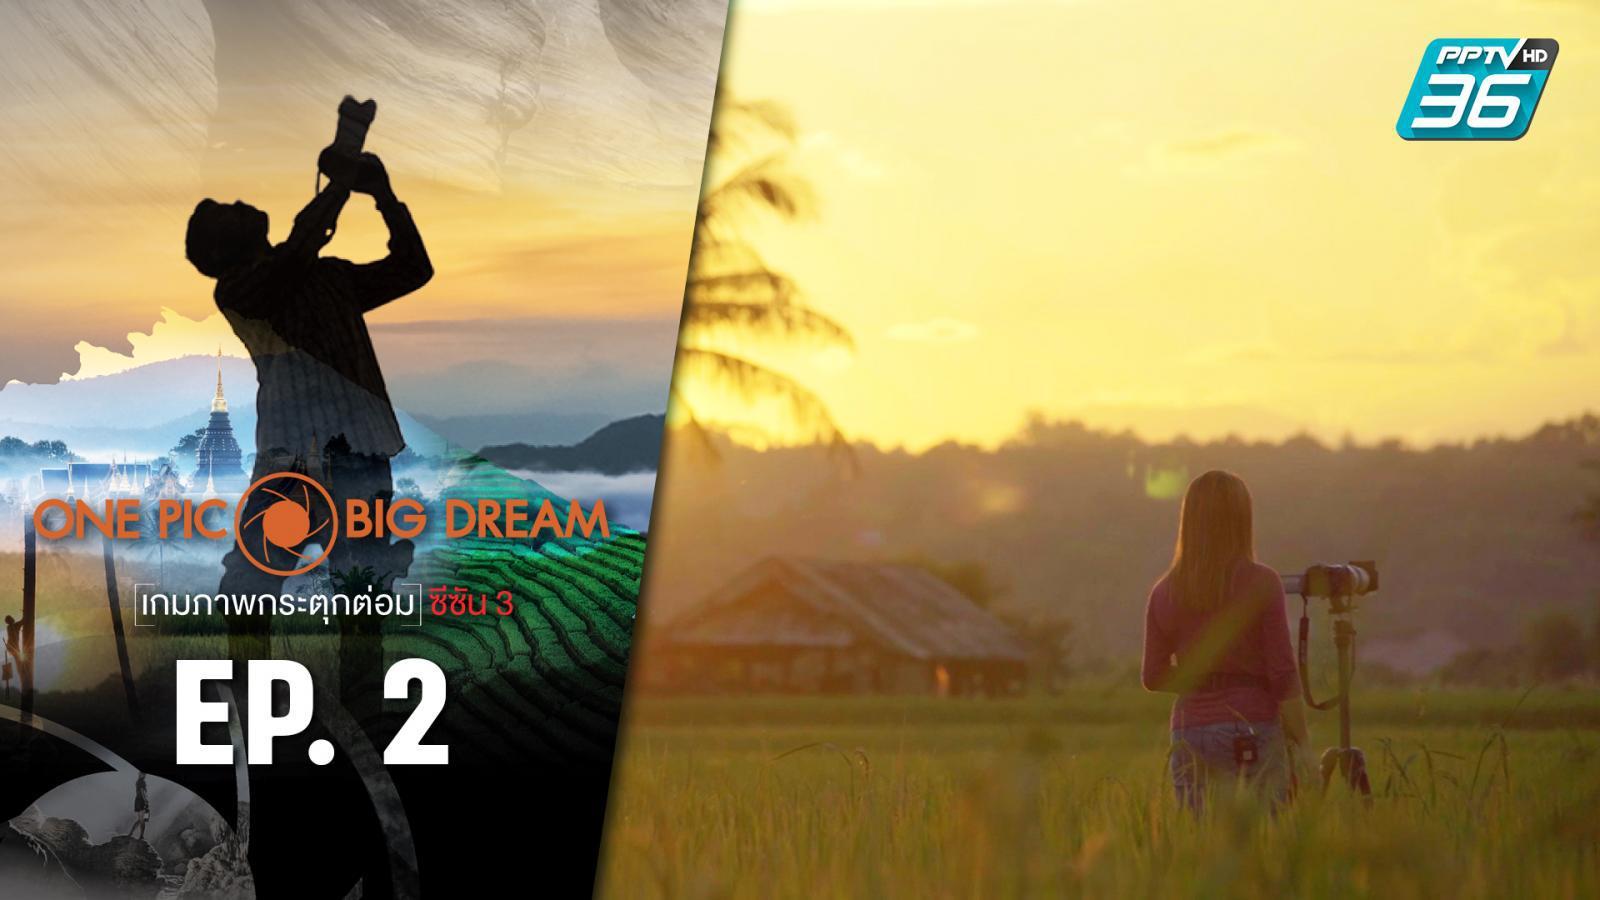 ONE PIC BIG DREAM เกมภาพกระตุกต่อม EP.2 ซีซัน 3   13 ม.ค. 64   PPTV HD 36